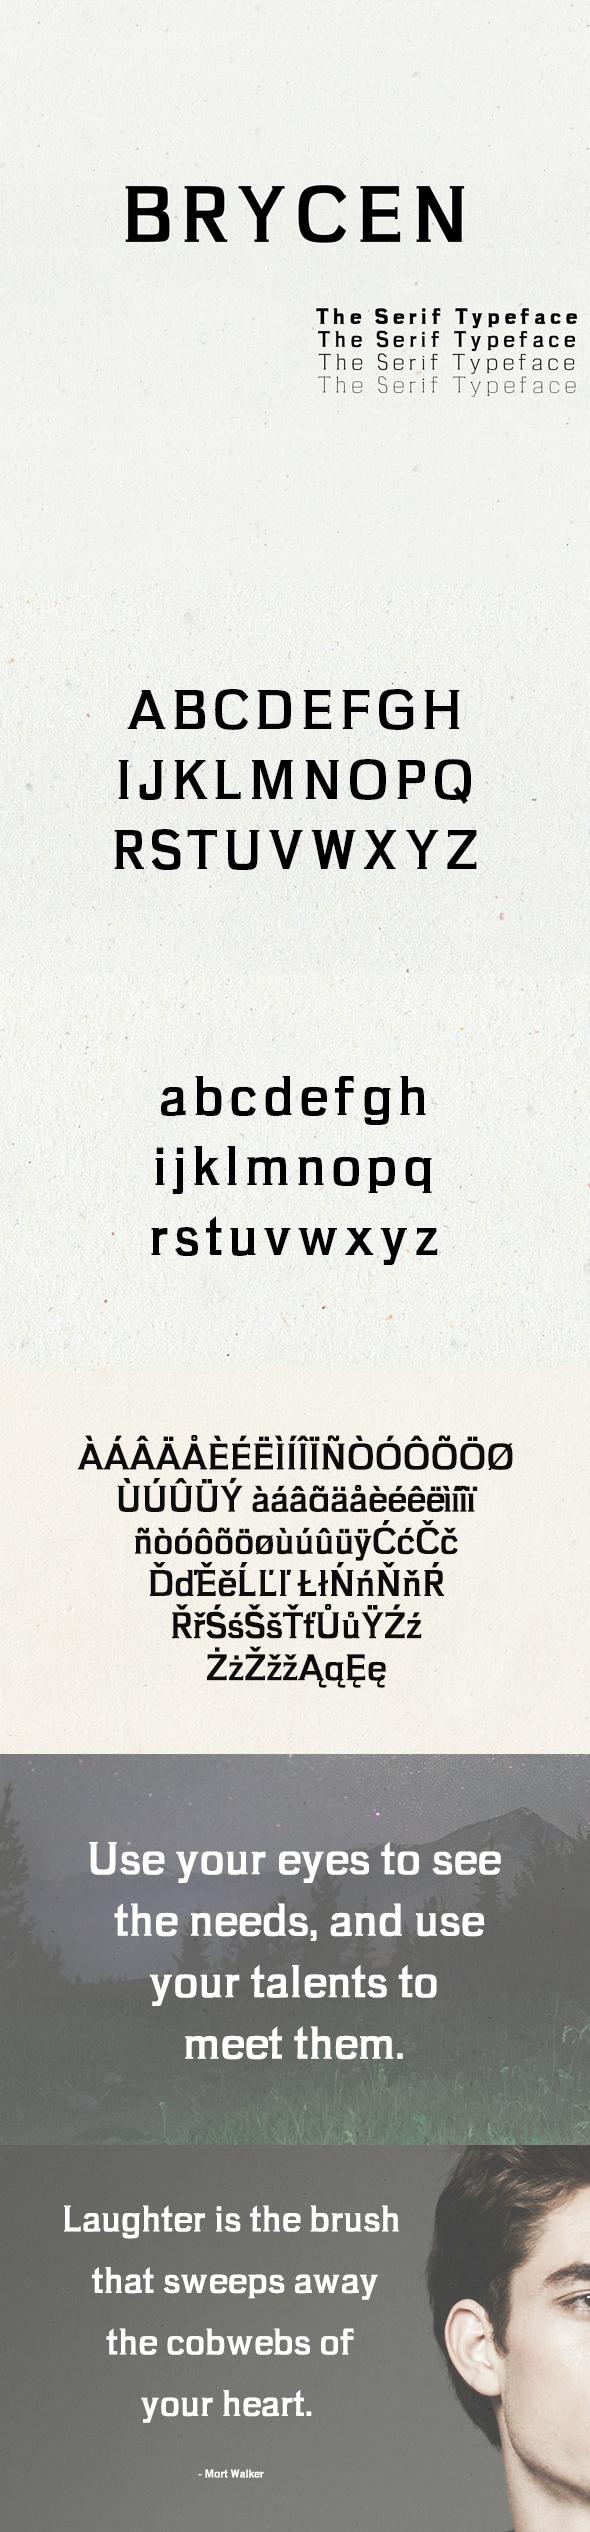 Brycen Serif Premium Font Family - Serif Fonts